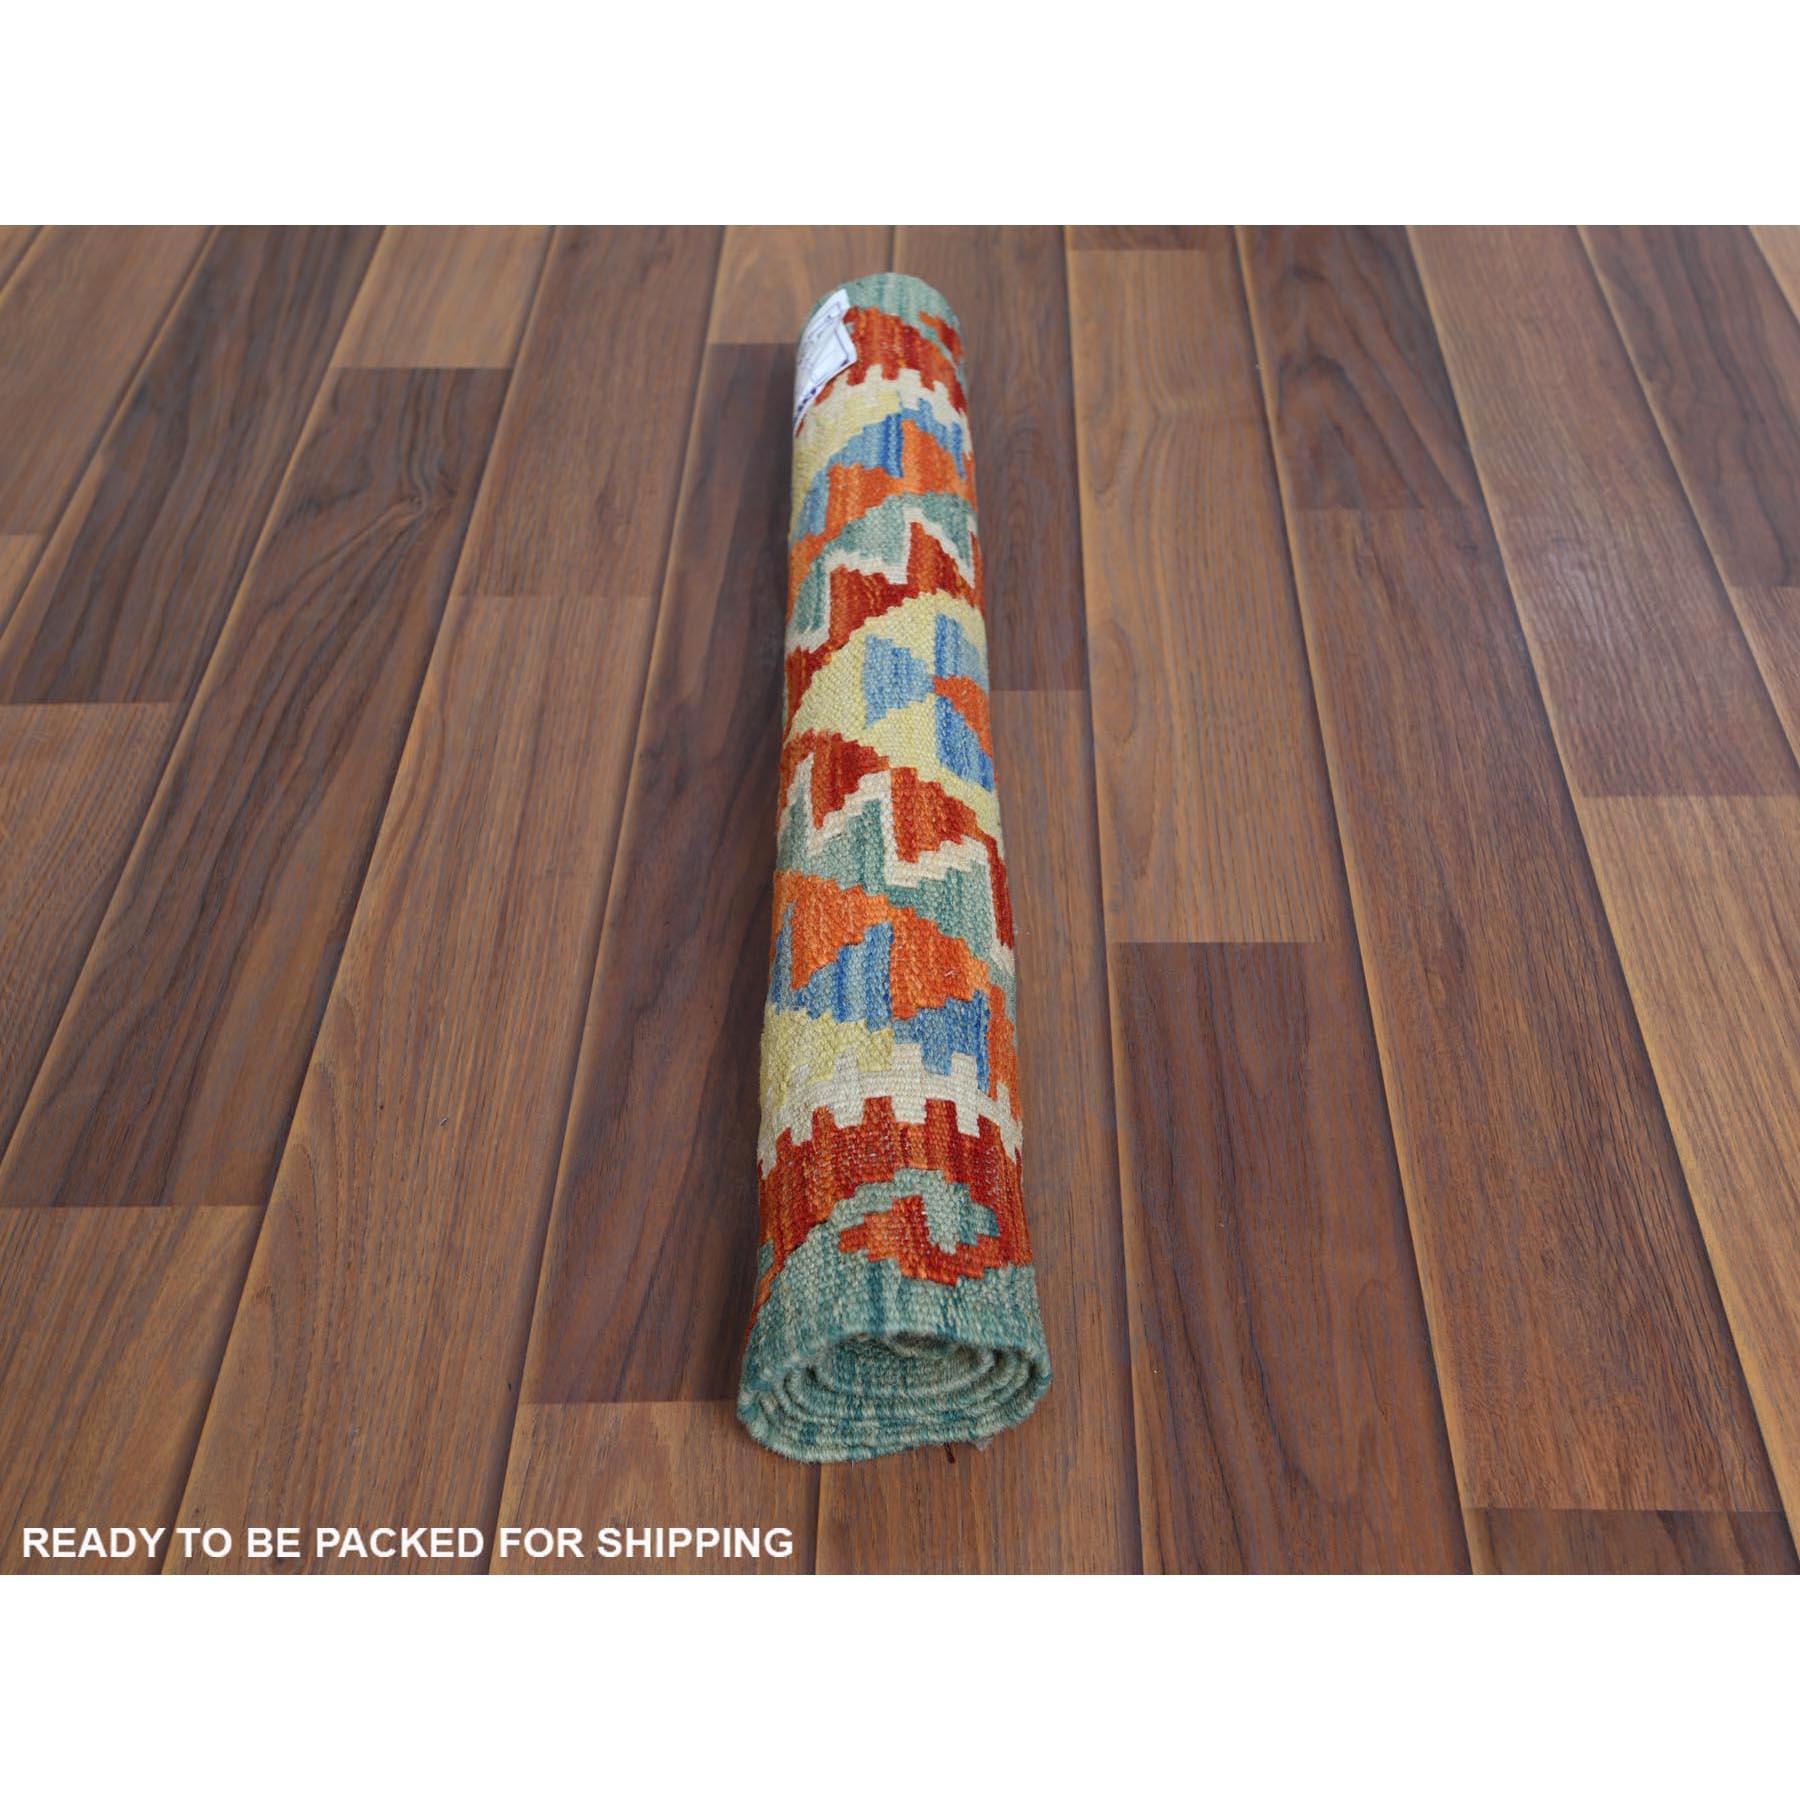 2'x3' Colorful Afghan Kilim Nomadic Design Reversible Natural Wool Hand Woven Oriental Rug